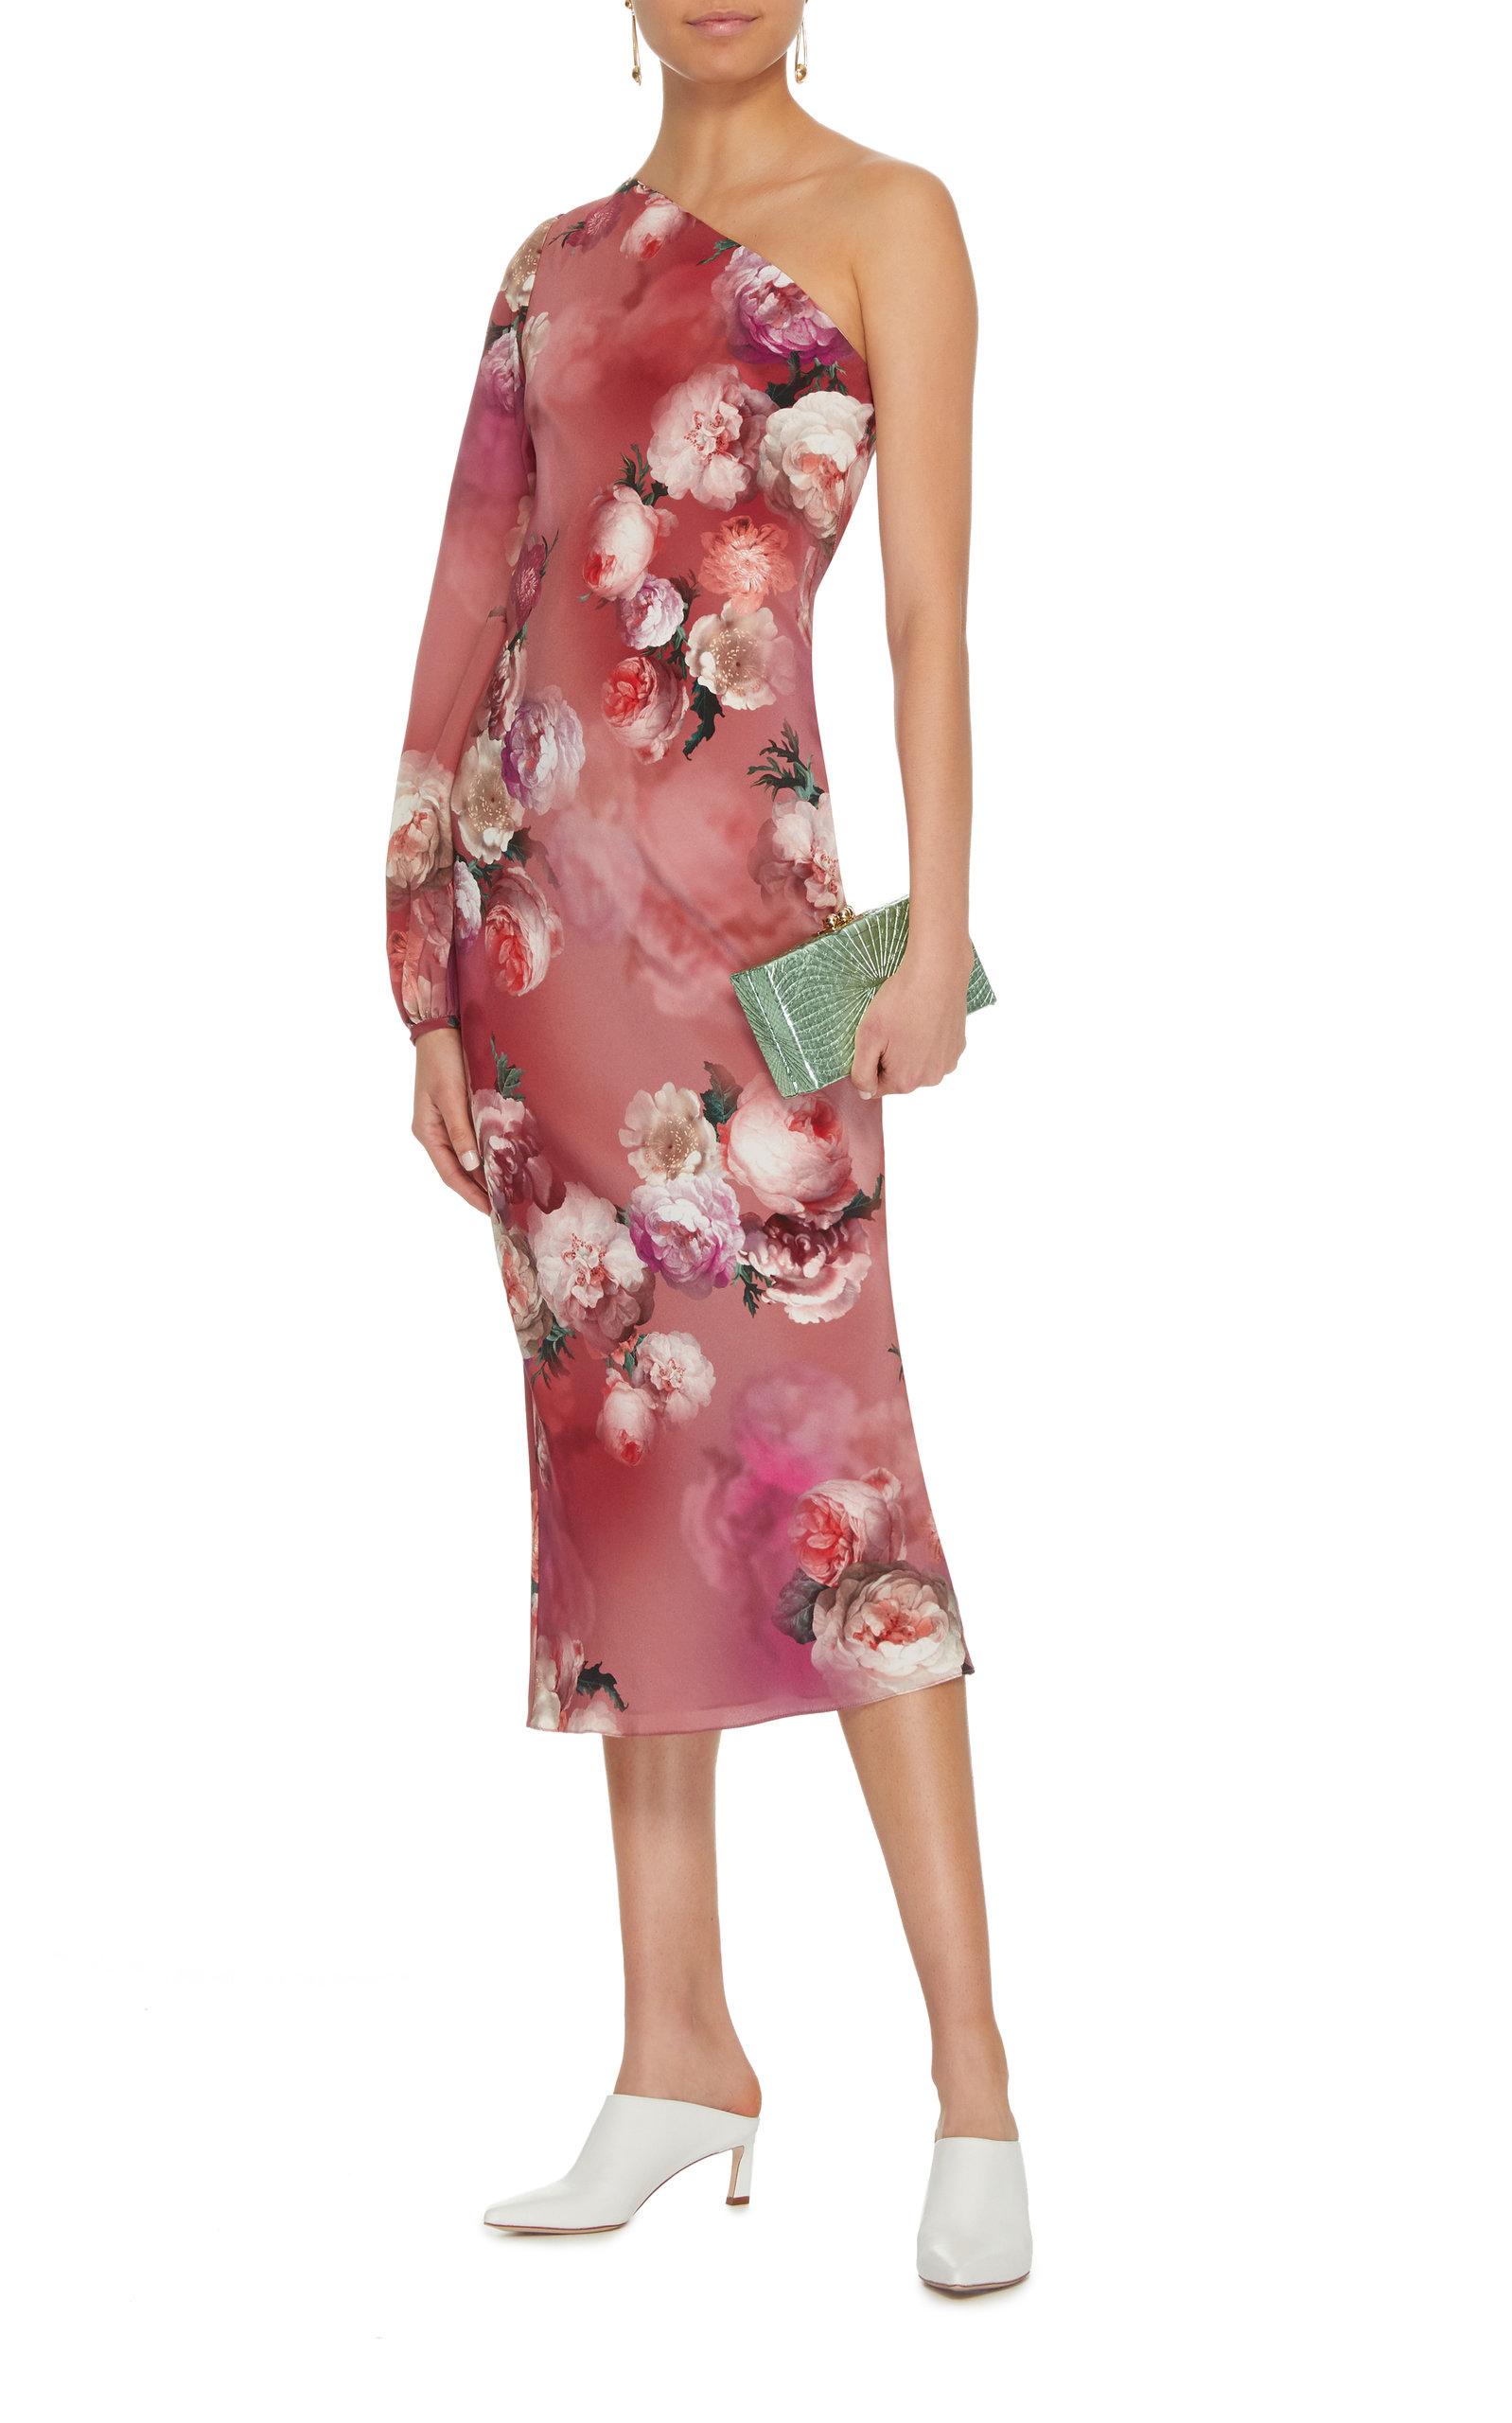 Zinnia One Shoulder Dress Markarian m6Op4lb5f